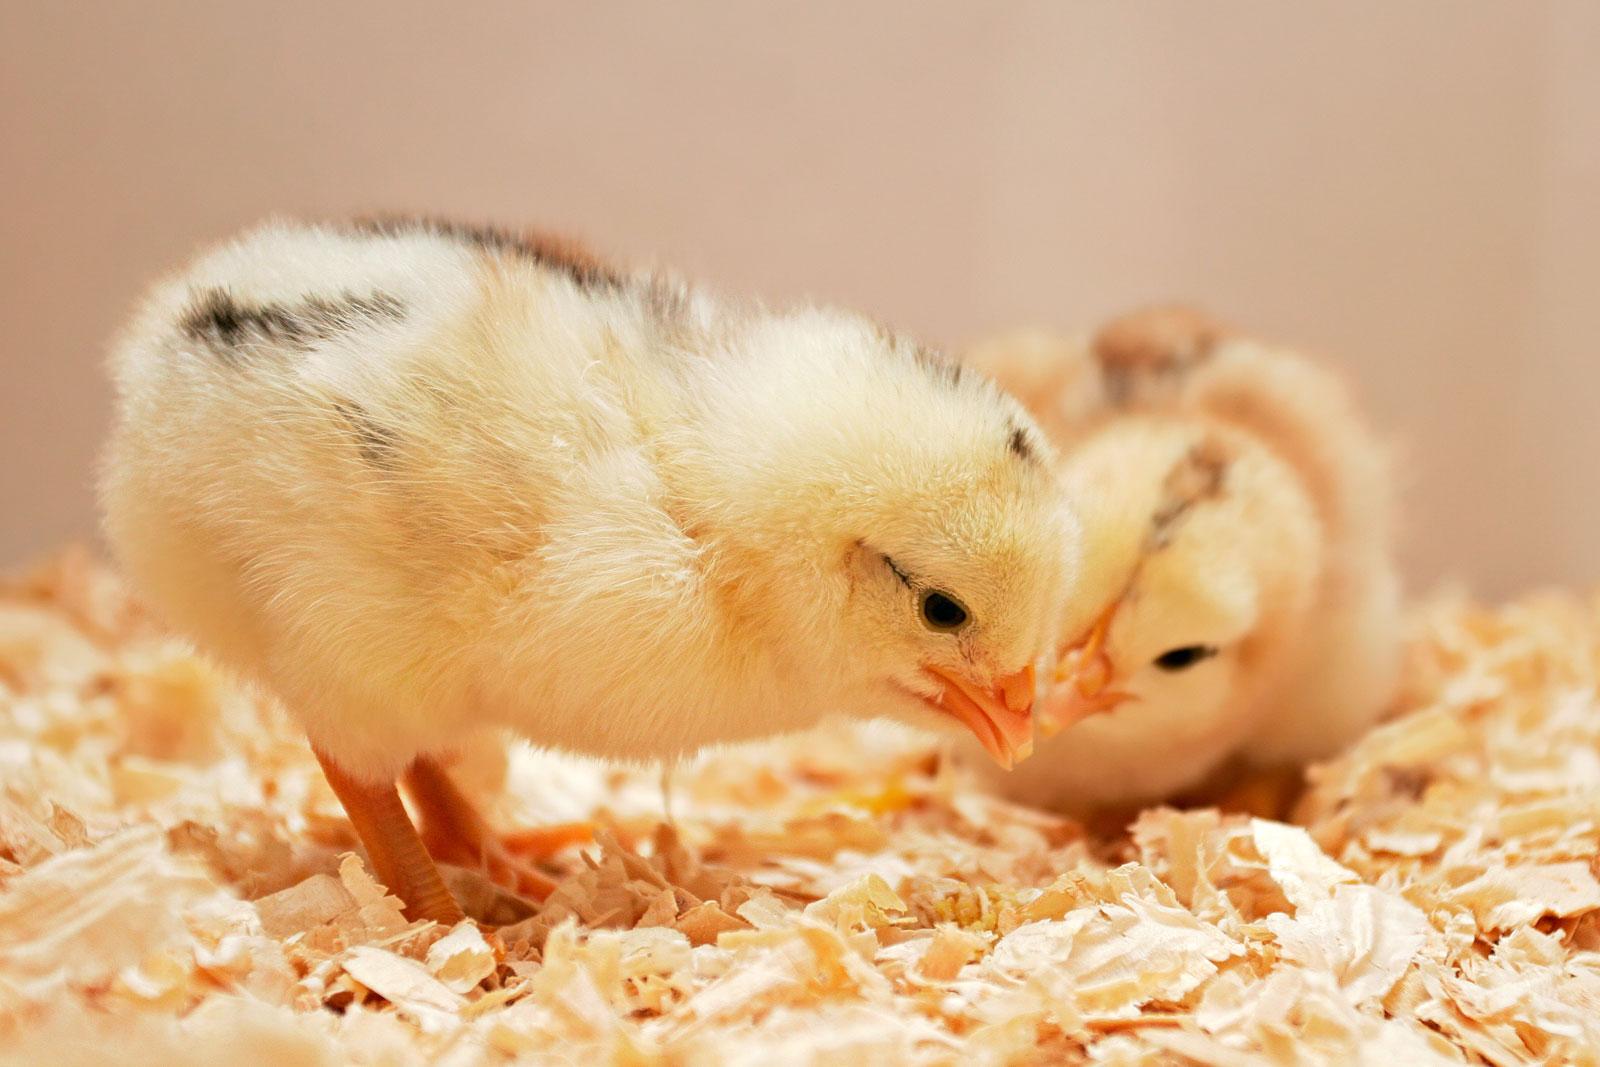 Old Chicks